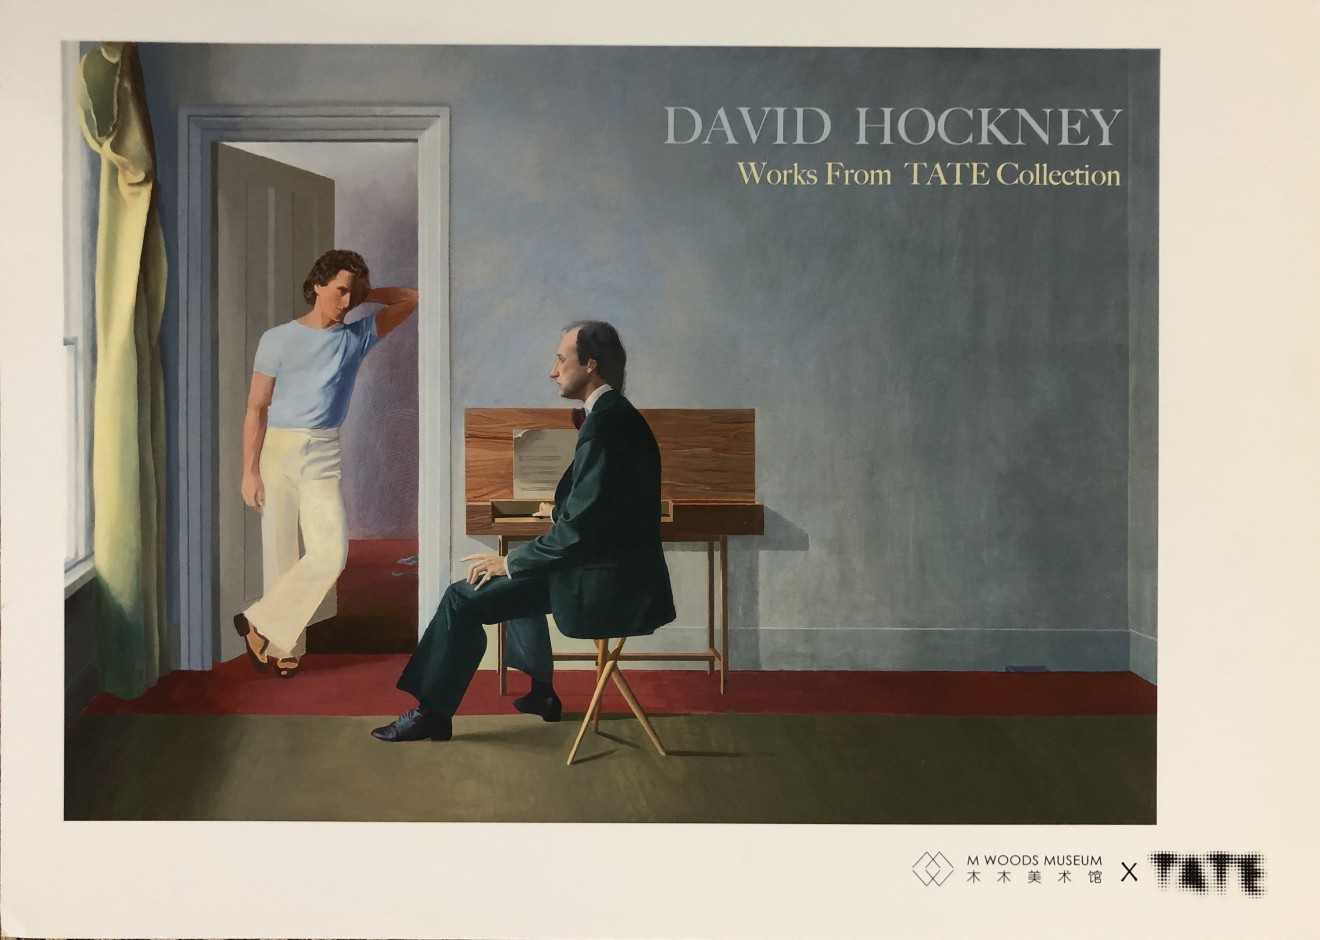 David Hockney, George Lawson and Wayne Sleep 1972-75, 2019